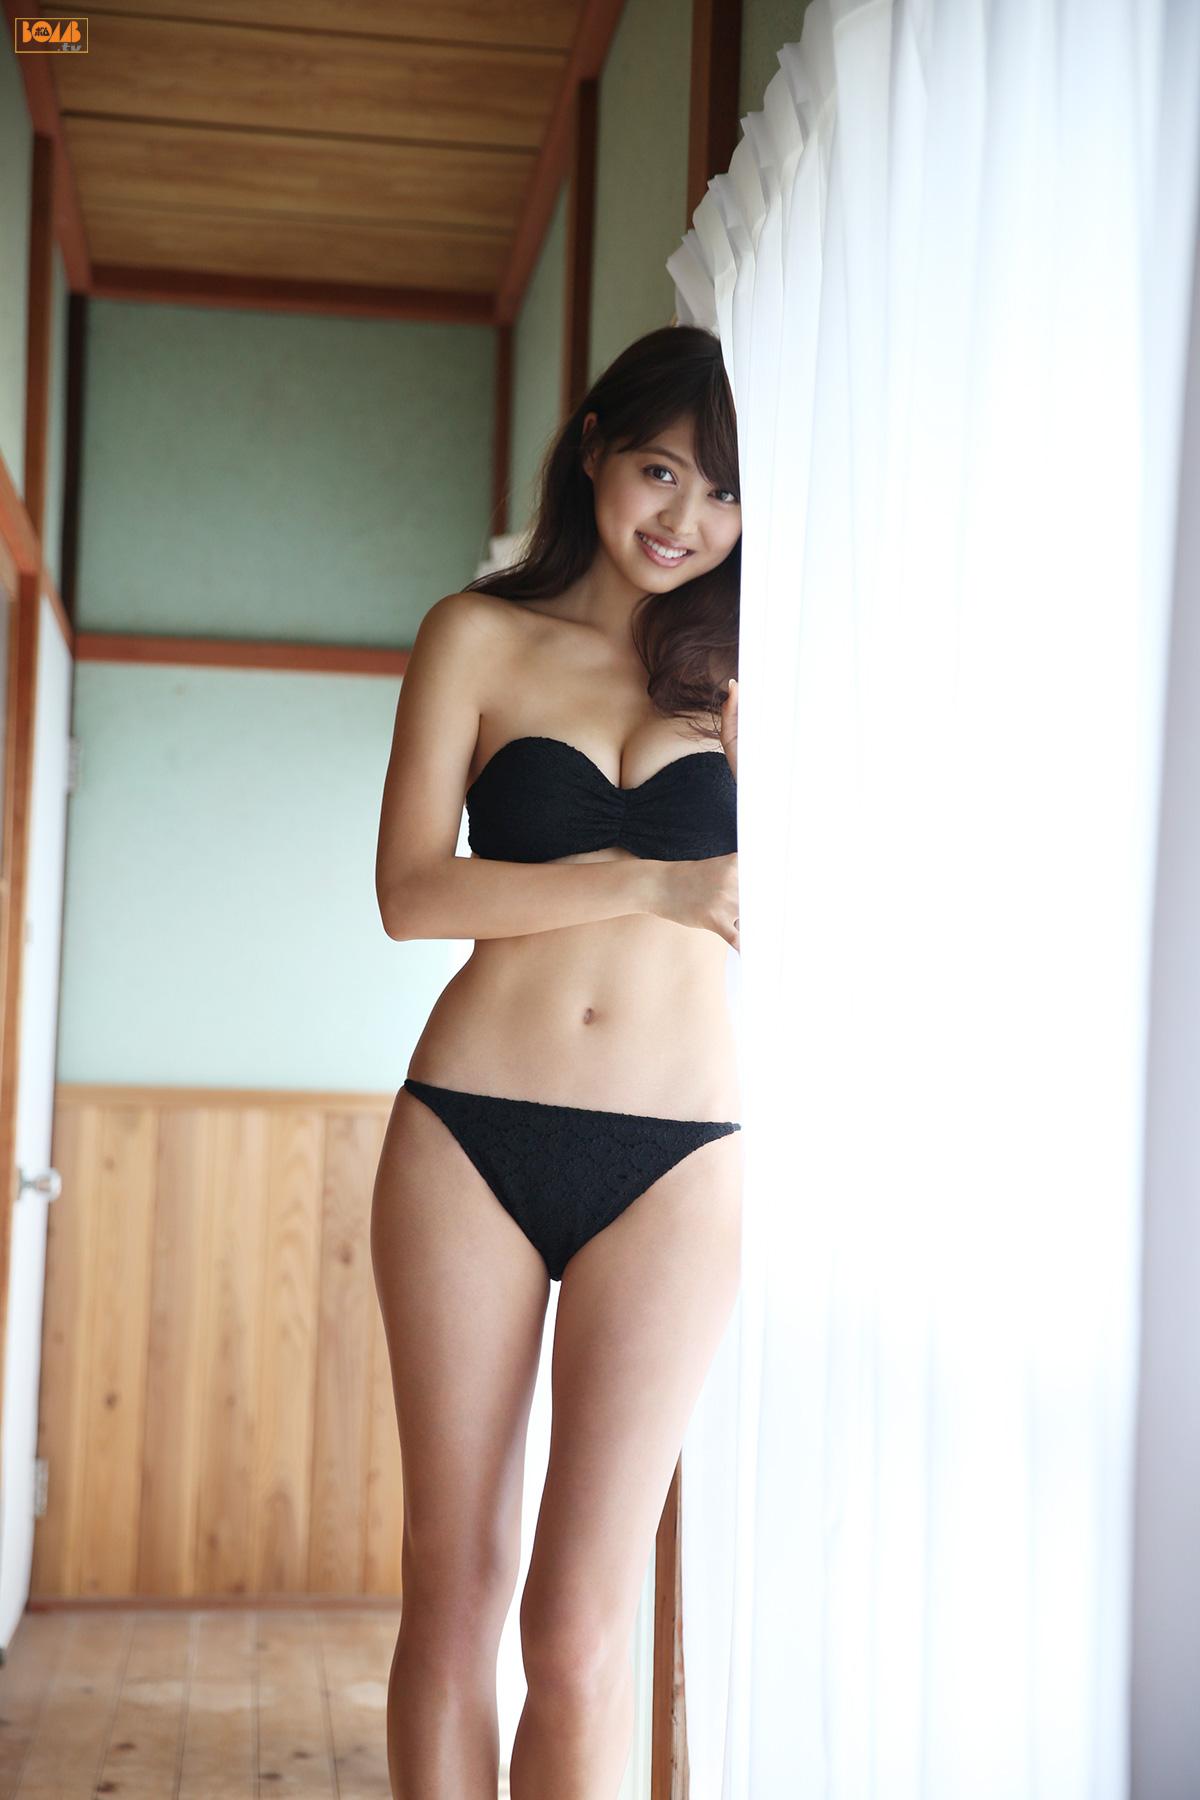 VOL.25 [Bomb.TV]清新阳光正妹妹子日本女星:松元绘里花(松元絵里花)超高清写真套图(58P)